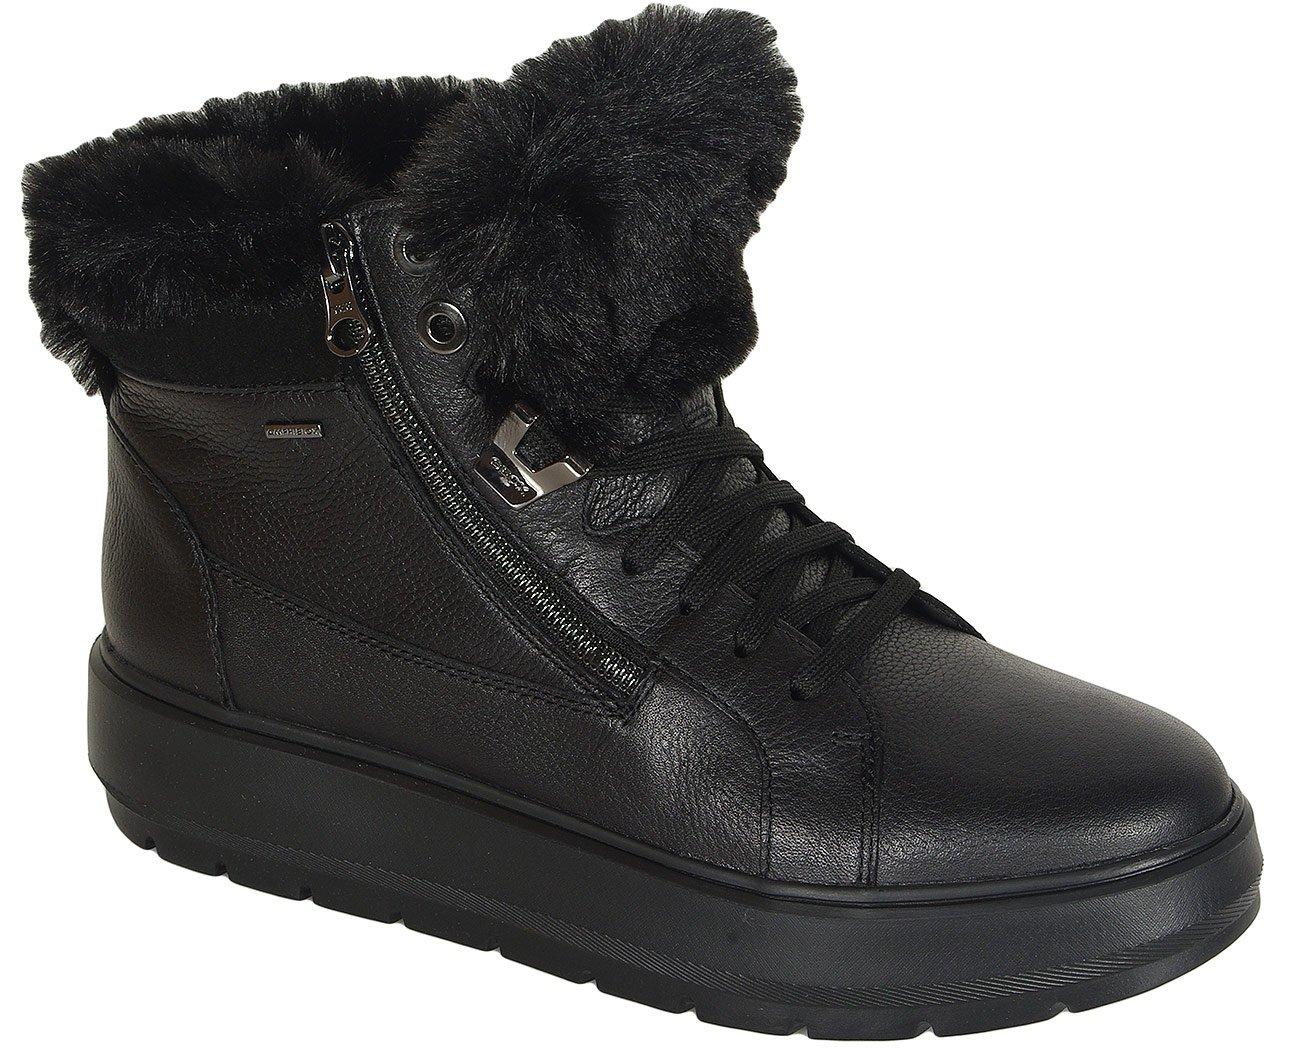 Geox Kaula B sneakers ABX leather black